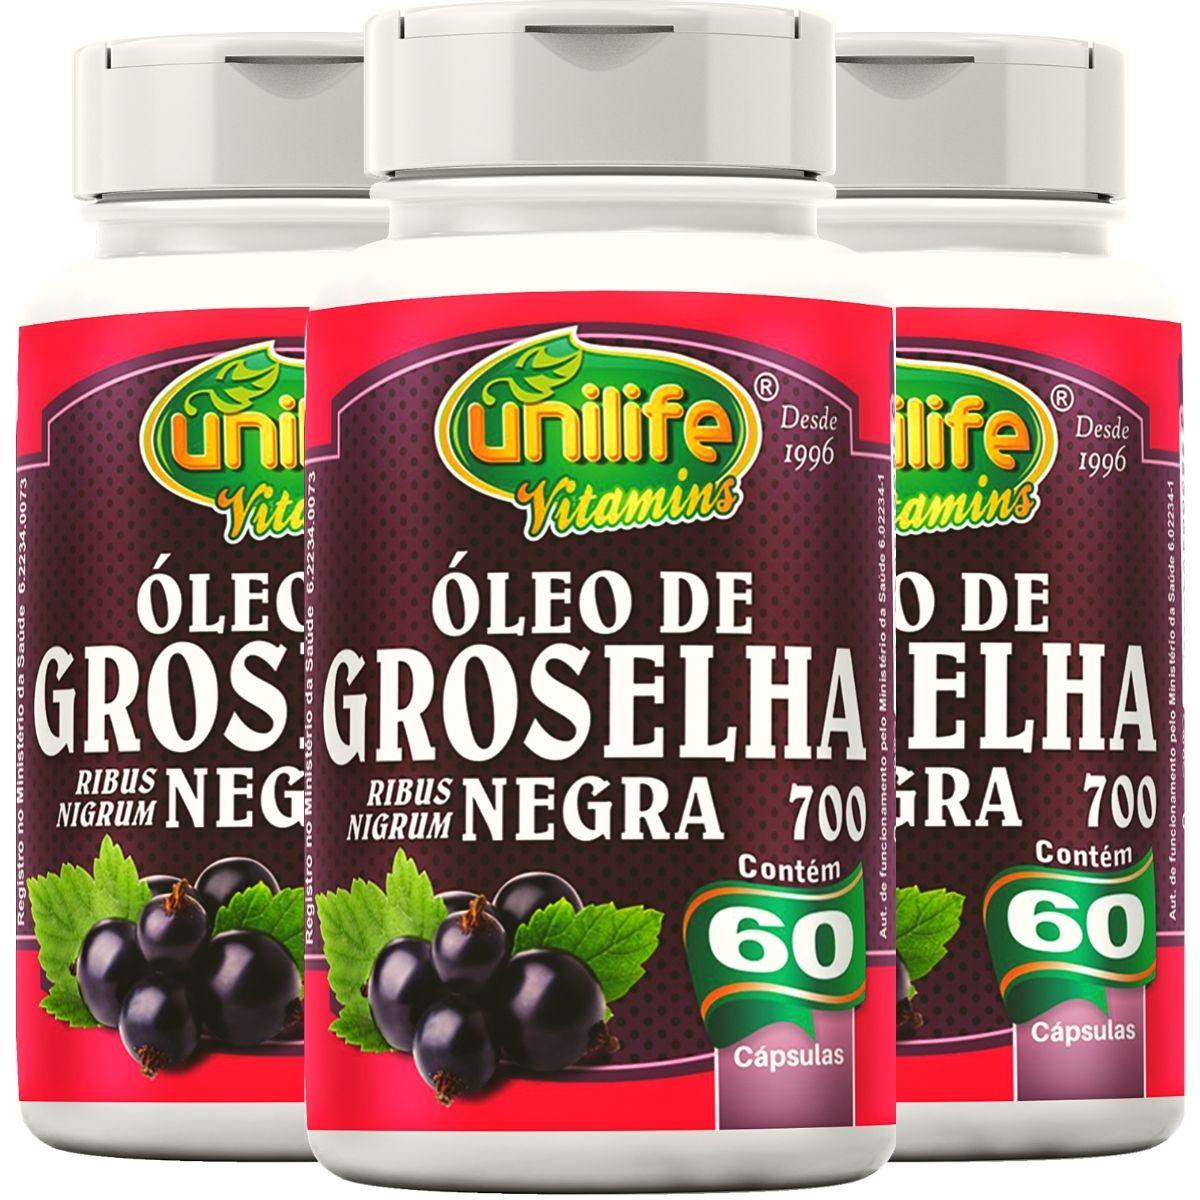 Kit 3 Óleo De Groselha Negra 60 Cápsulas 700mg - Unilife